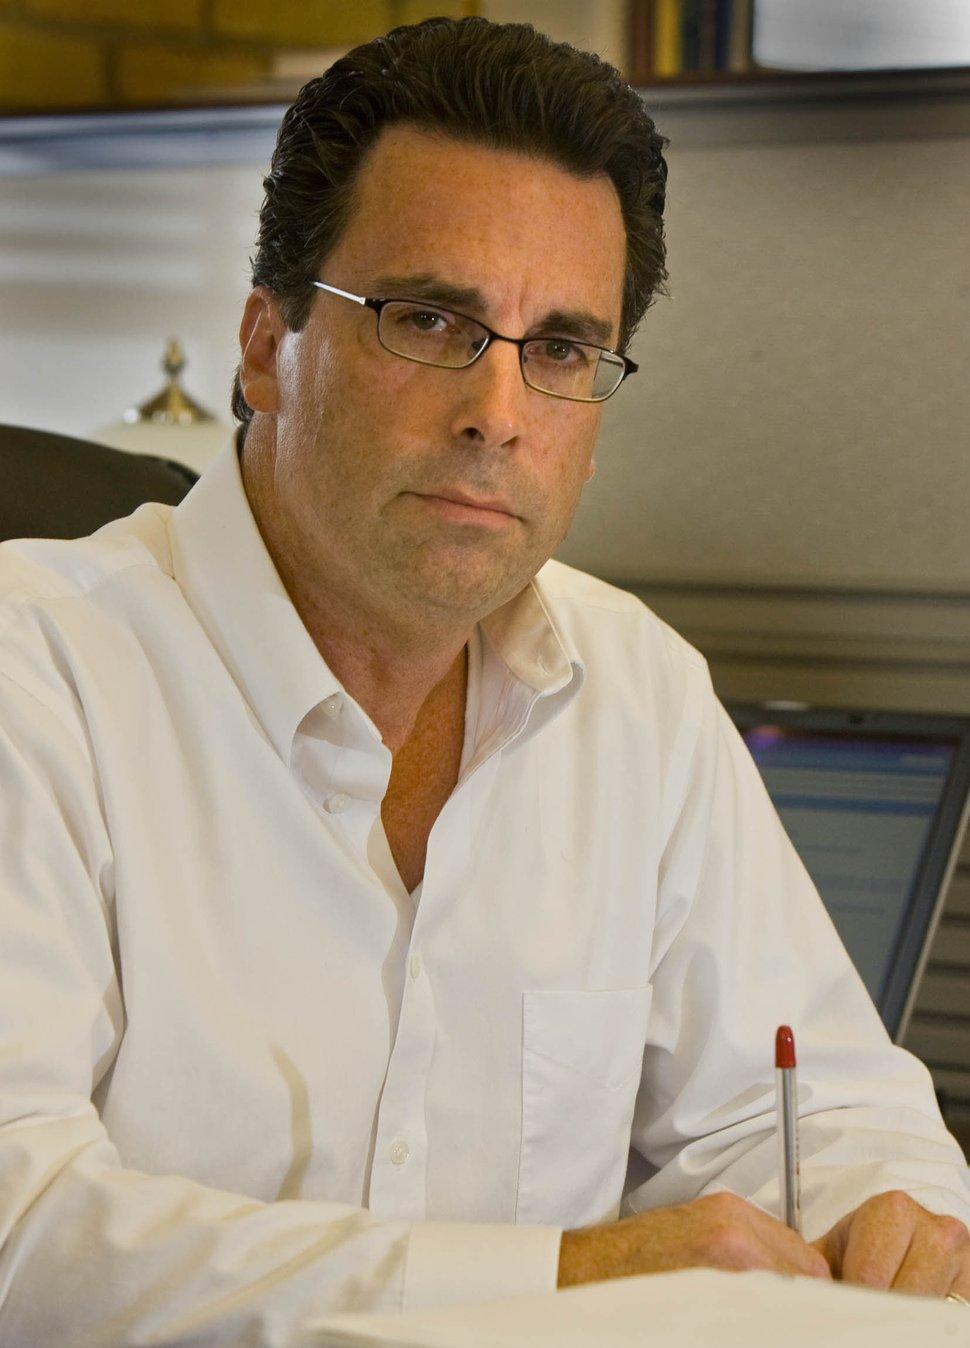 Paul T. Mero | Next Generation Freedom Fund